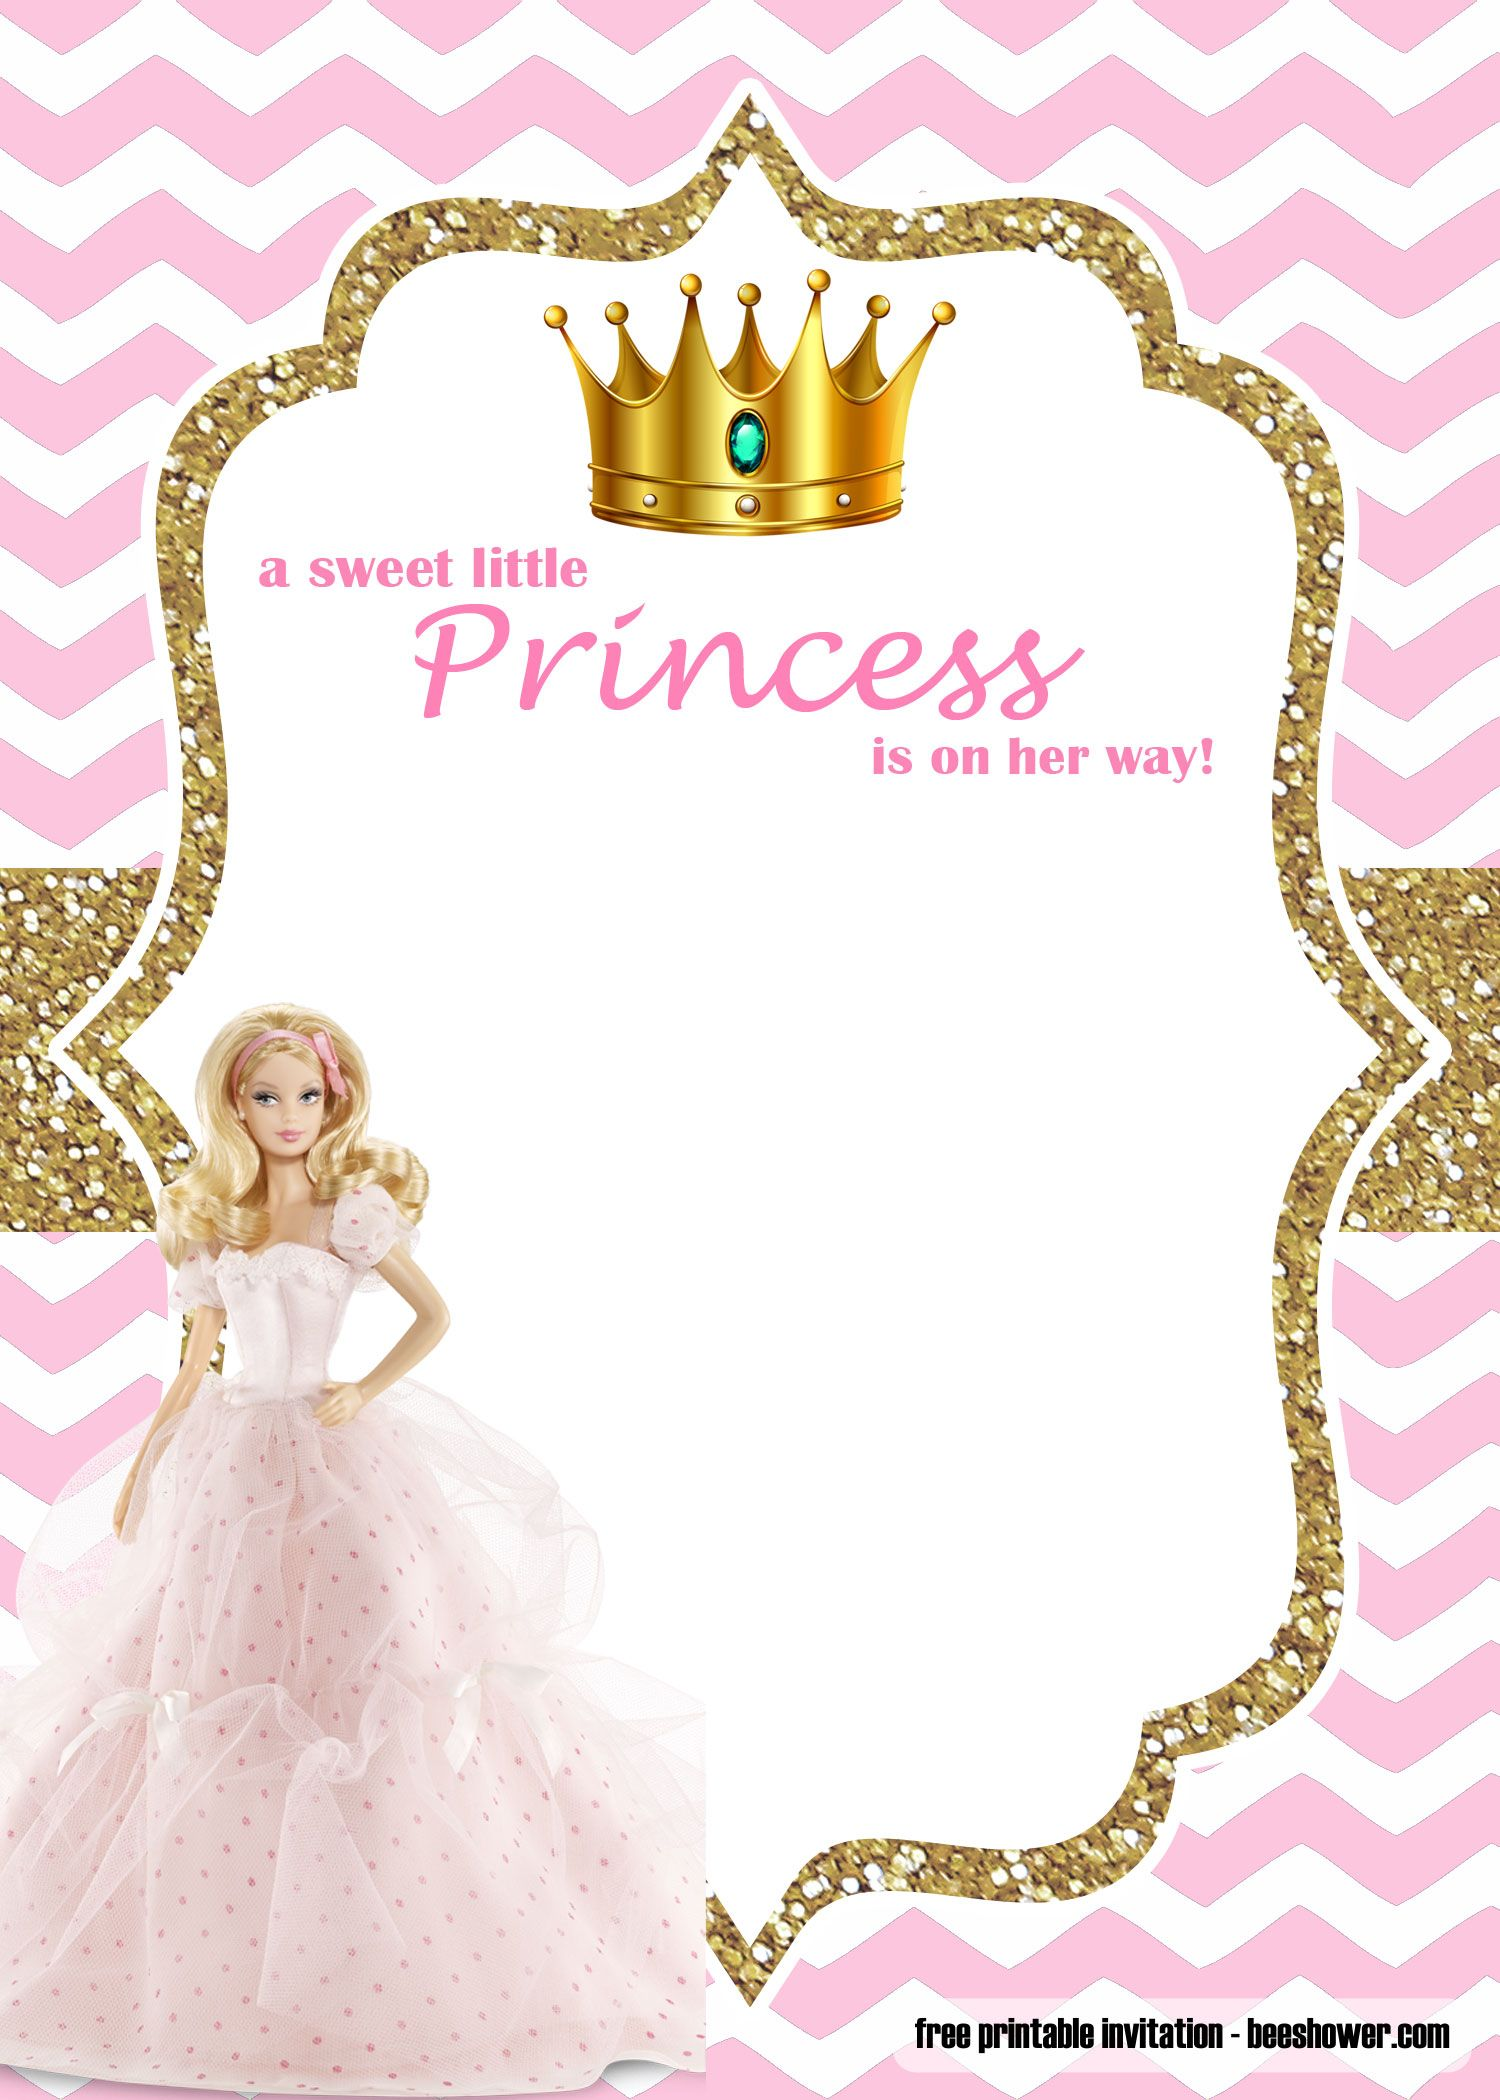 Free Princess Barbie Baby Shower Invitations Templates Princess Baby Shower Invitation Baby Shower Invitations Gold Baby Shower Invitations Princess baby shower invitations template